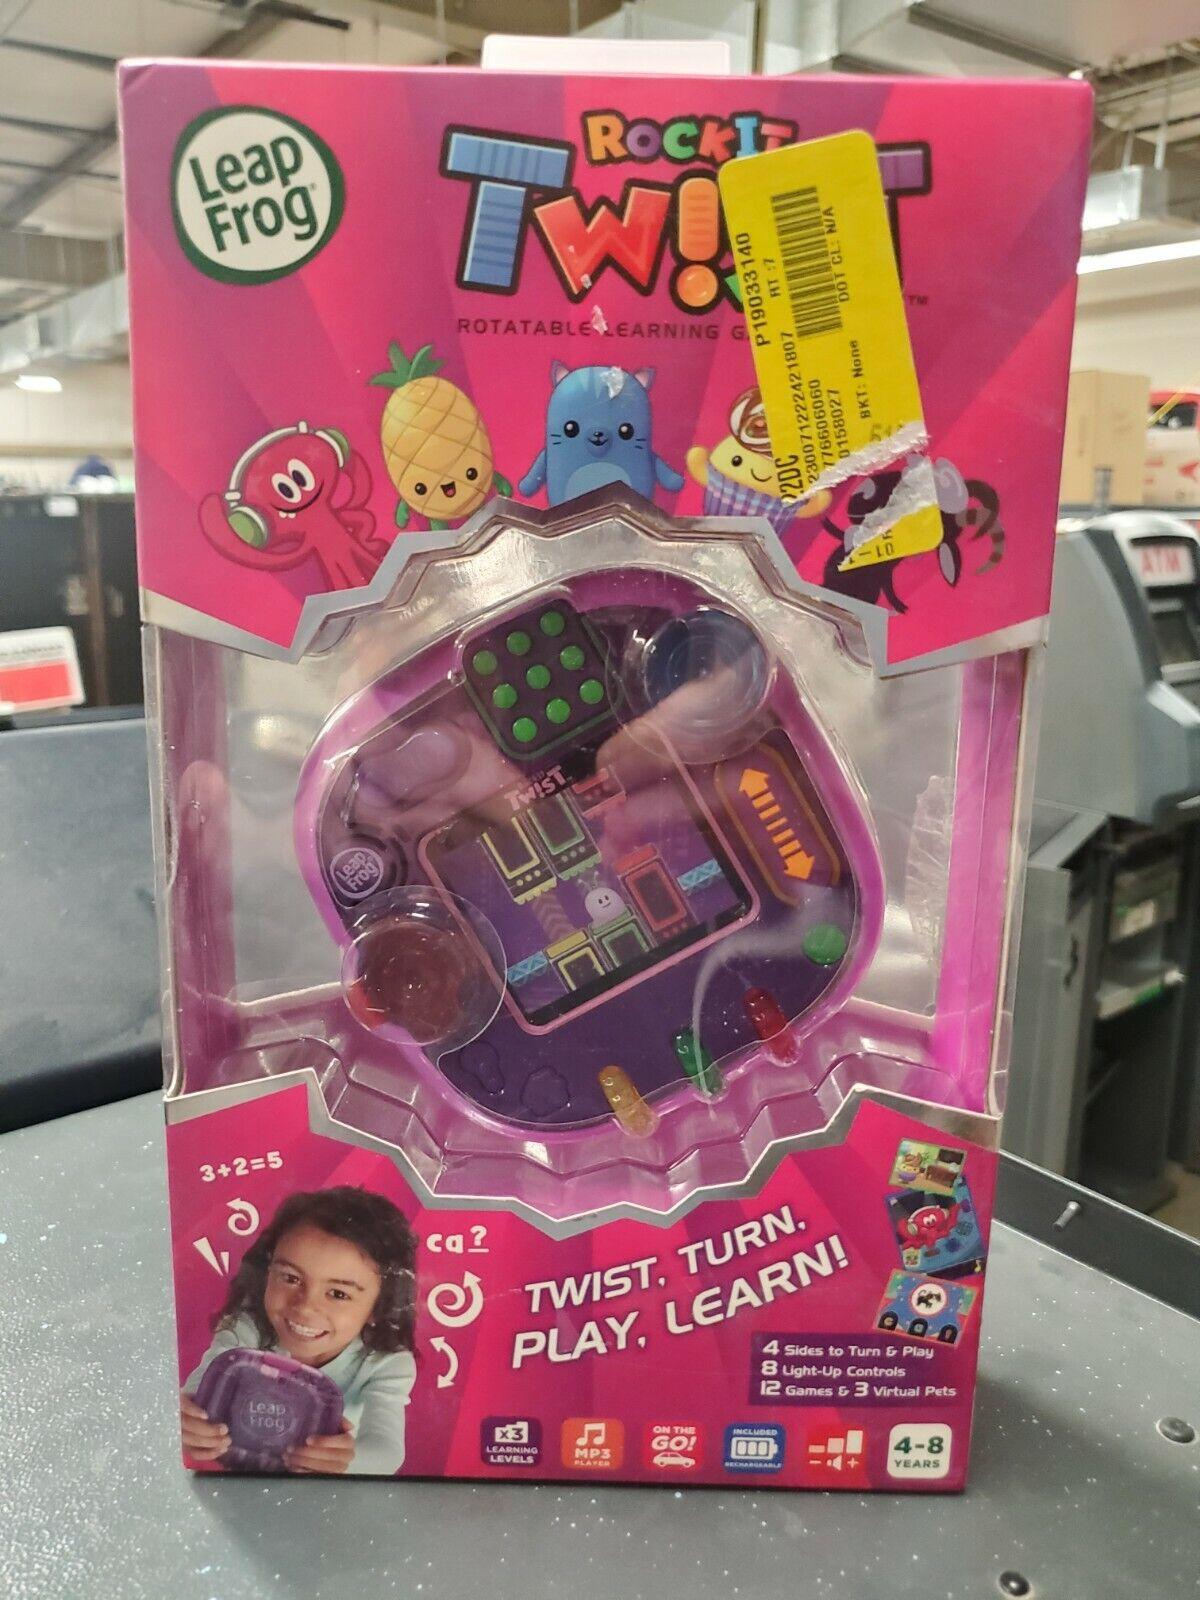 rockit twist kids handheld learning game system